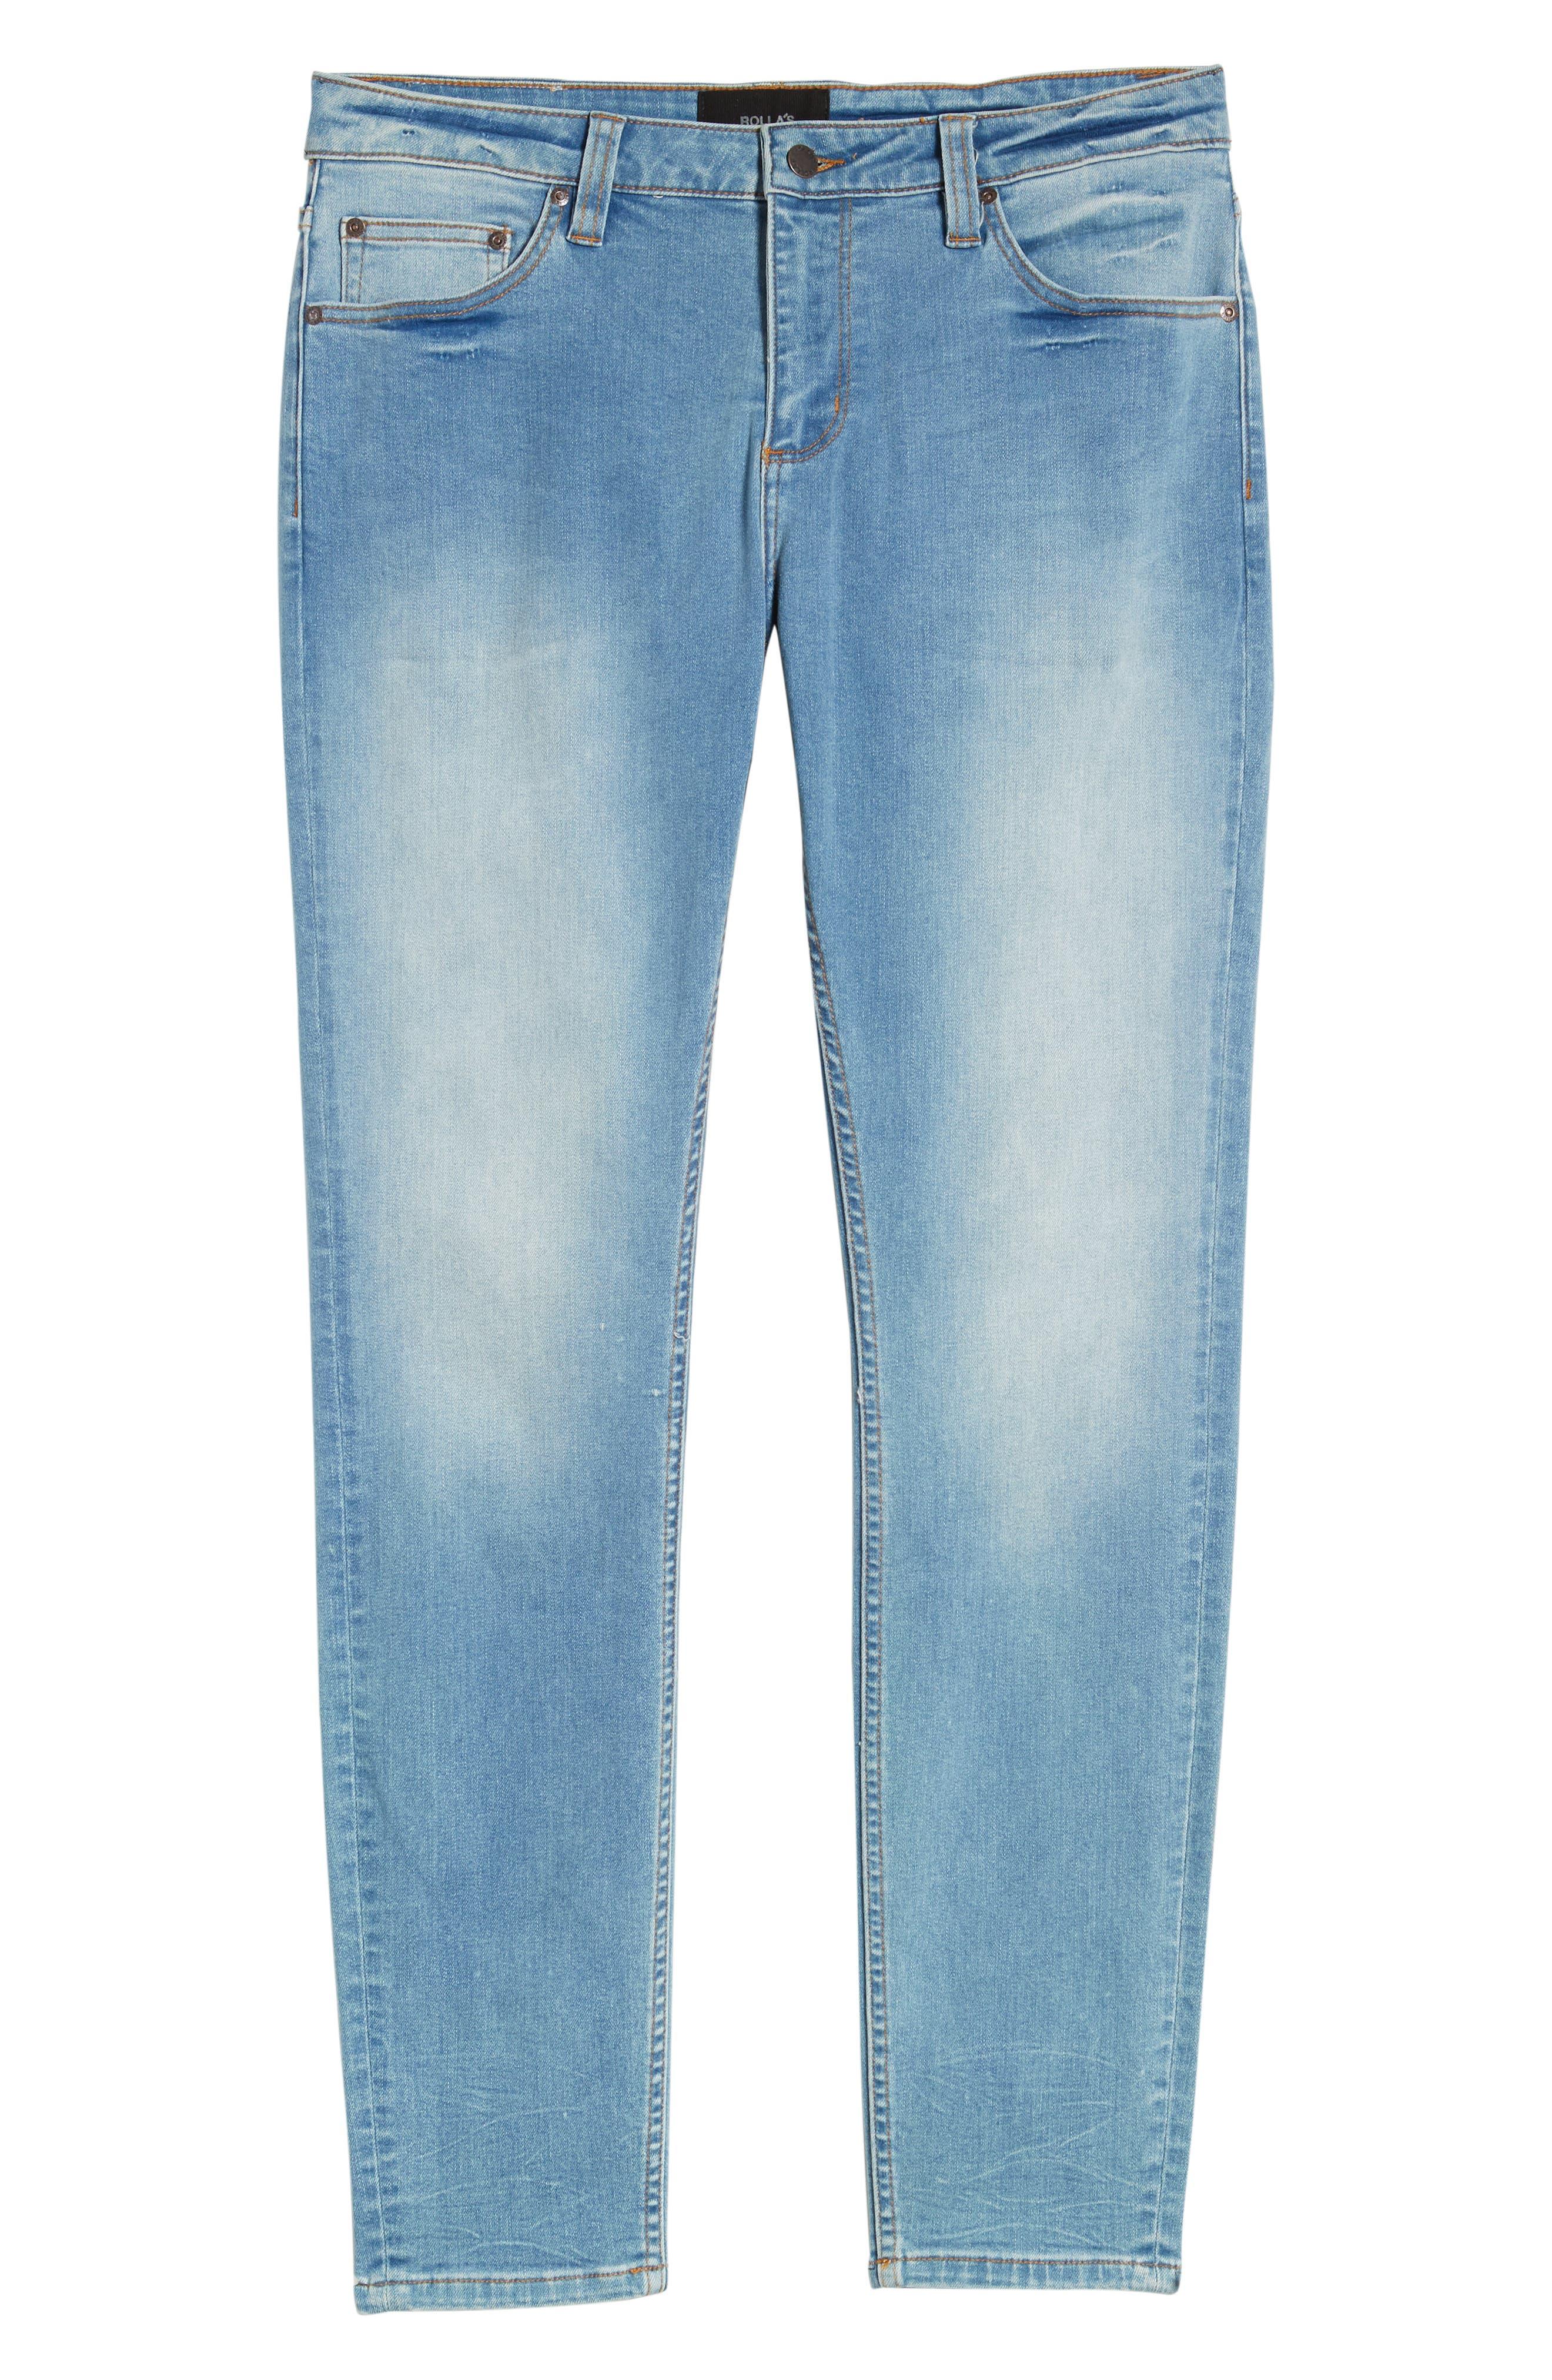 Stinger Skinny Fit Jeans,                             Alternate thumbnail 4, color,                             AUTHENTIC BLUE